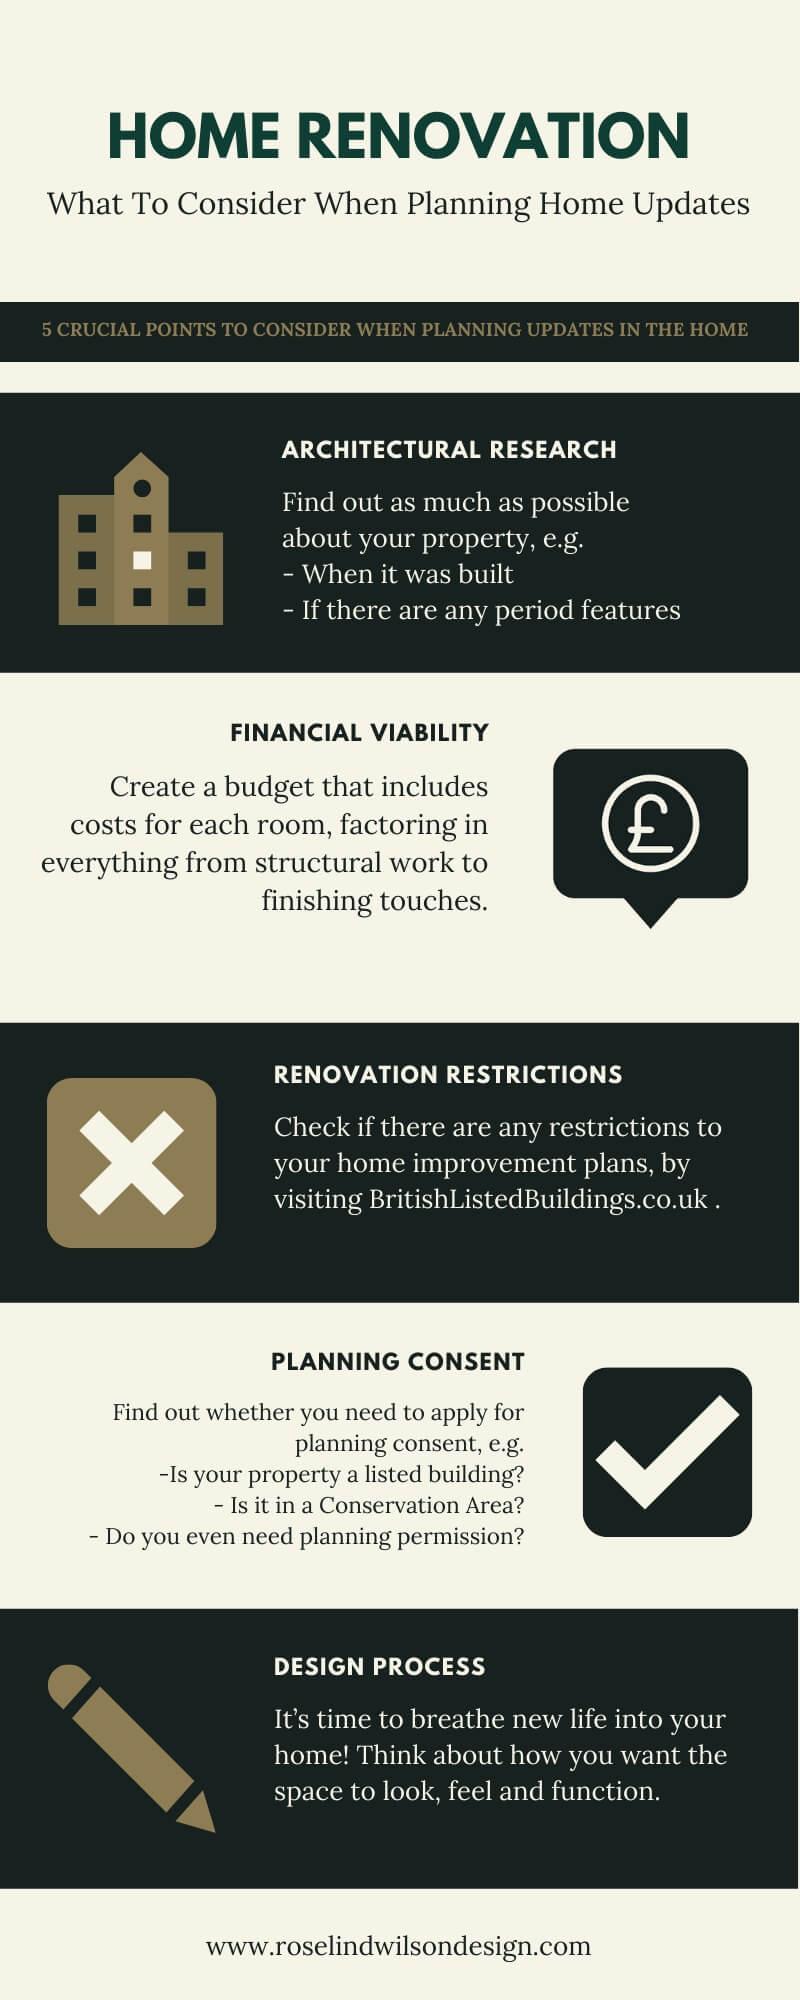 home renovation infographic